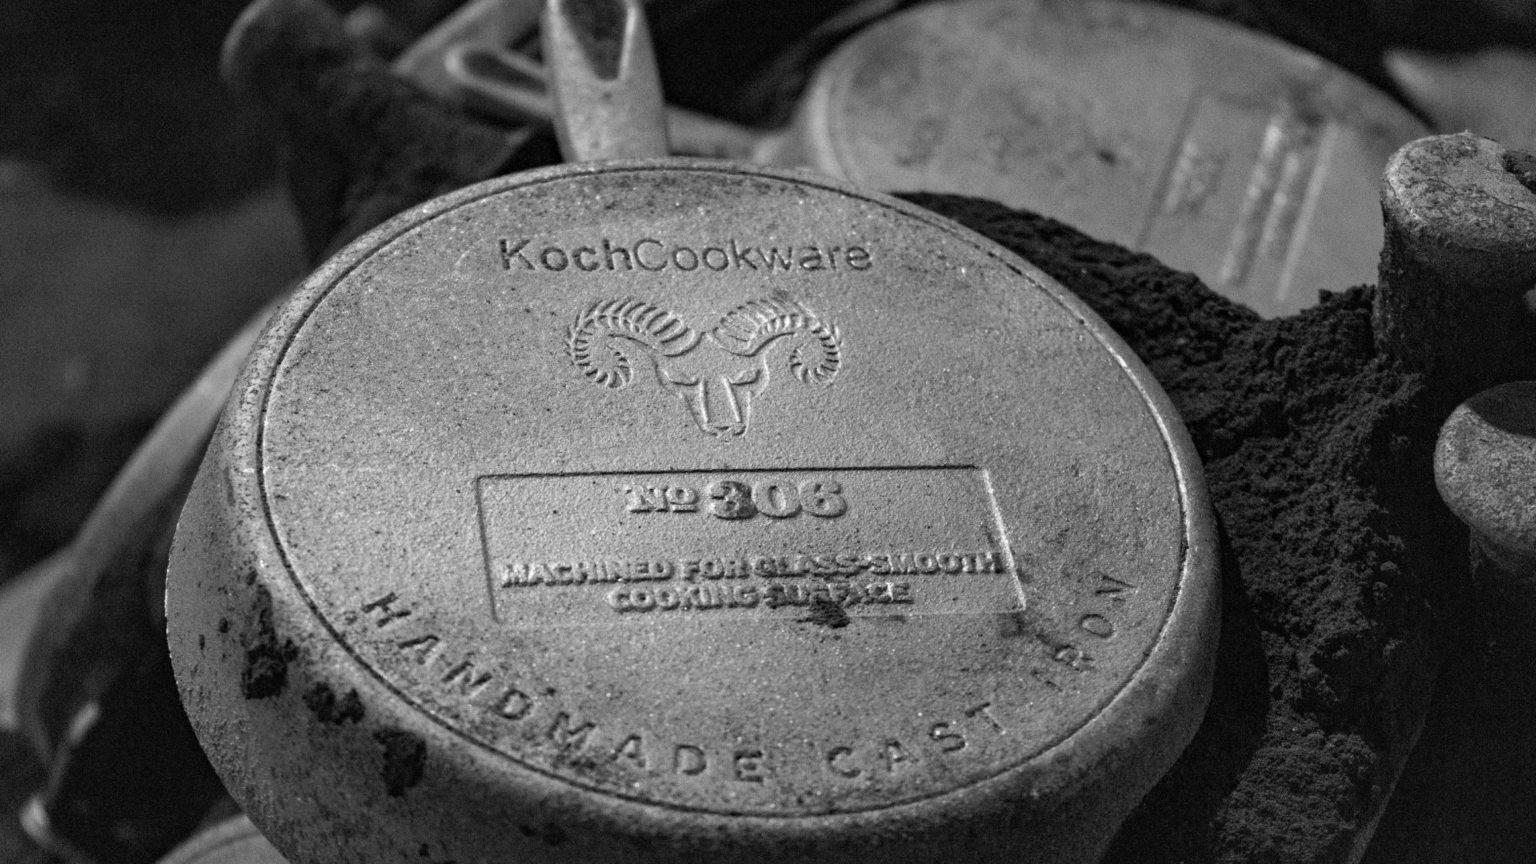 KochCookware No 306 handmade10.25 inch premium cast iron skillet unseasoned